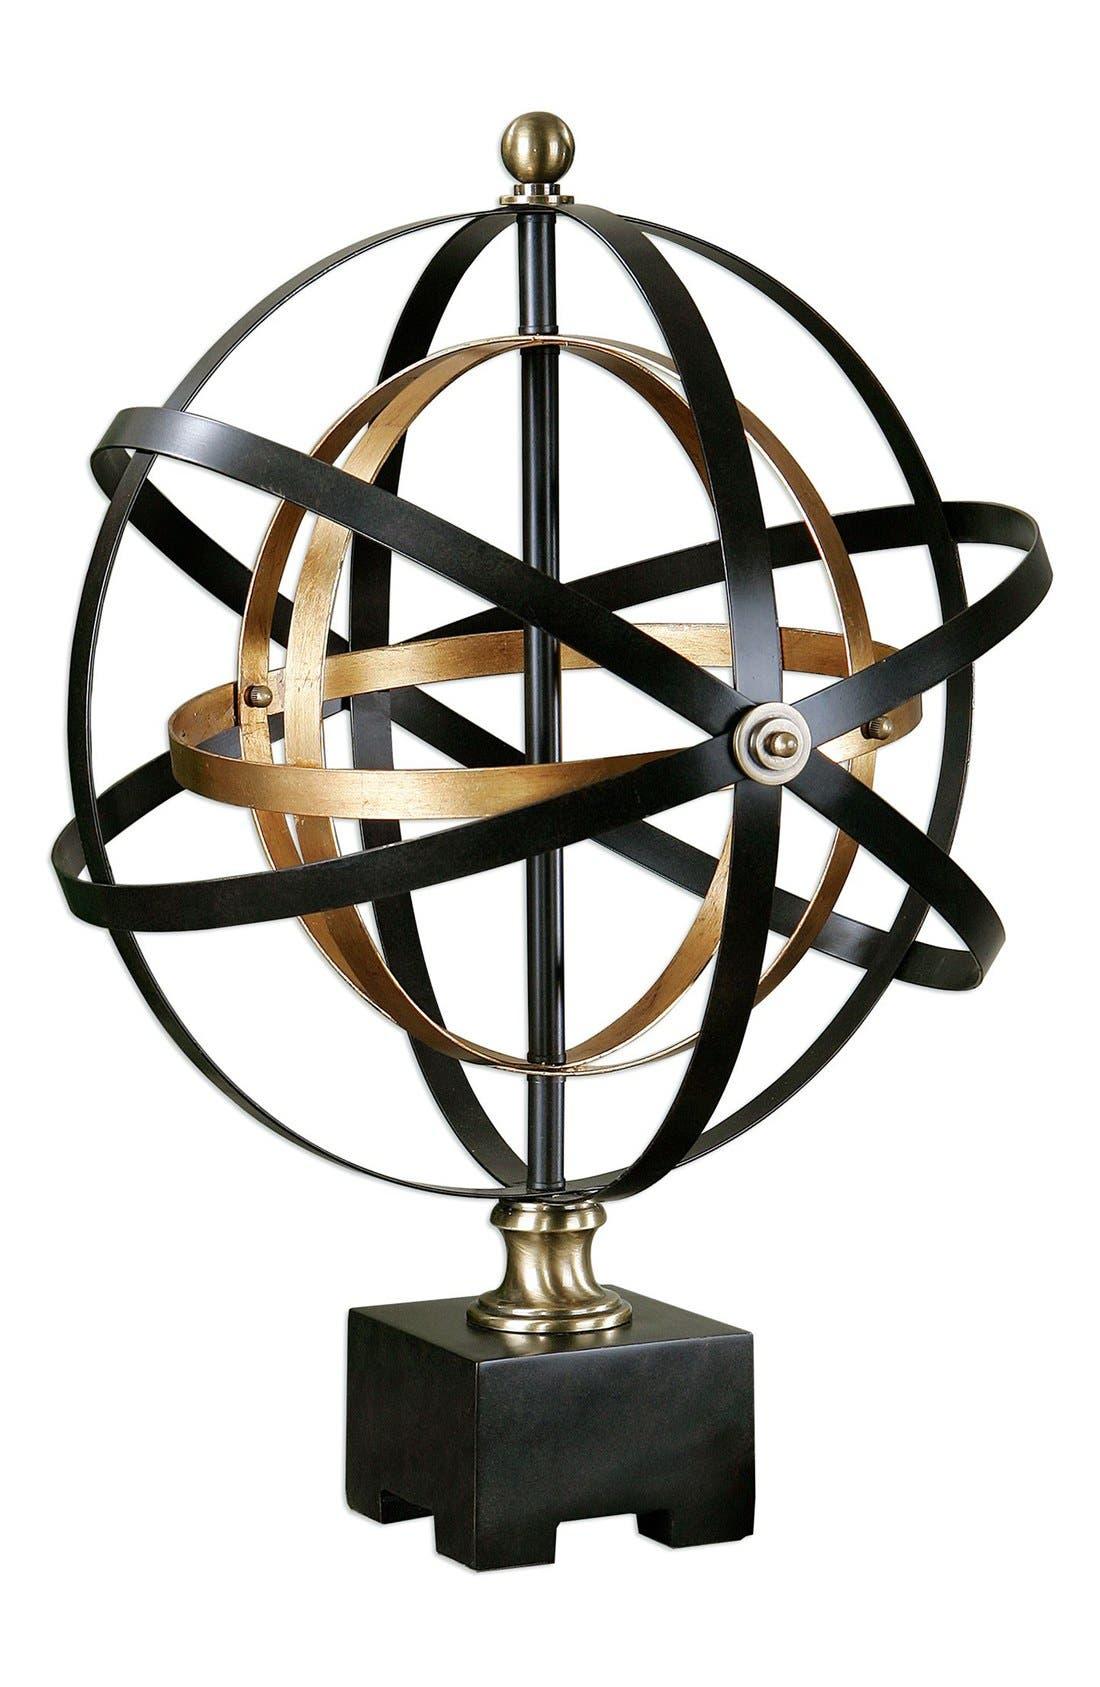 Main Image - Uttermost Orb Sculpture